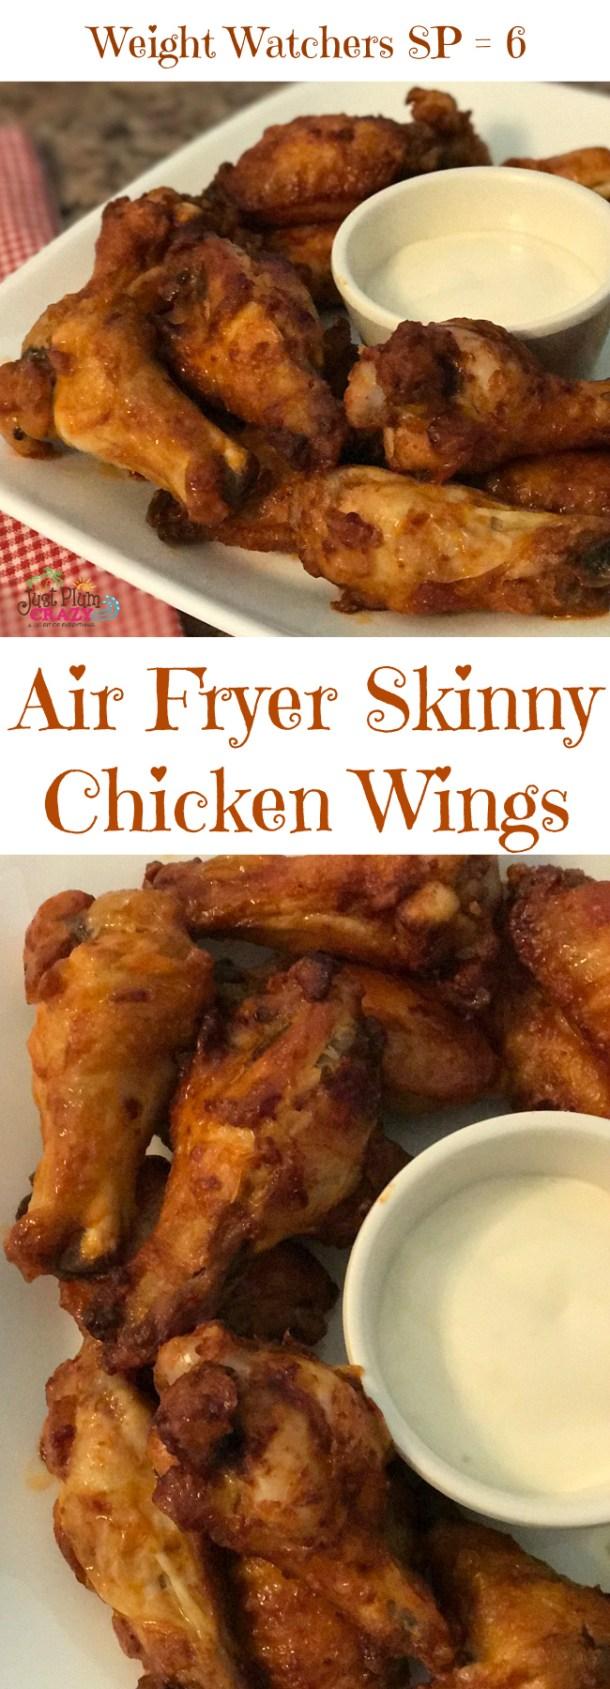 https://plumcrazyaboutcoupons.com/wp-content/uploads/2017/04/Air-Fryer-Skinny-Chicken-Wings-Recipe-WW-SP-6-.jpg